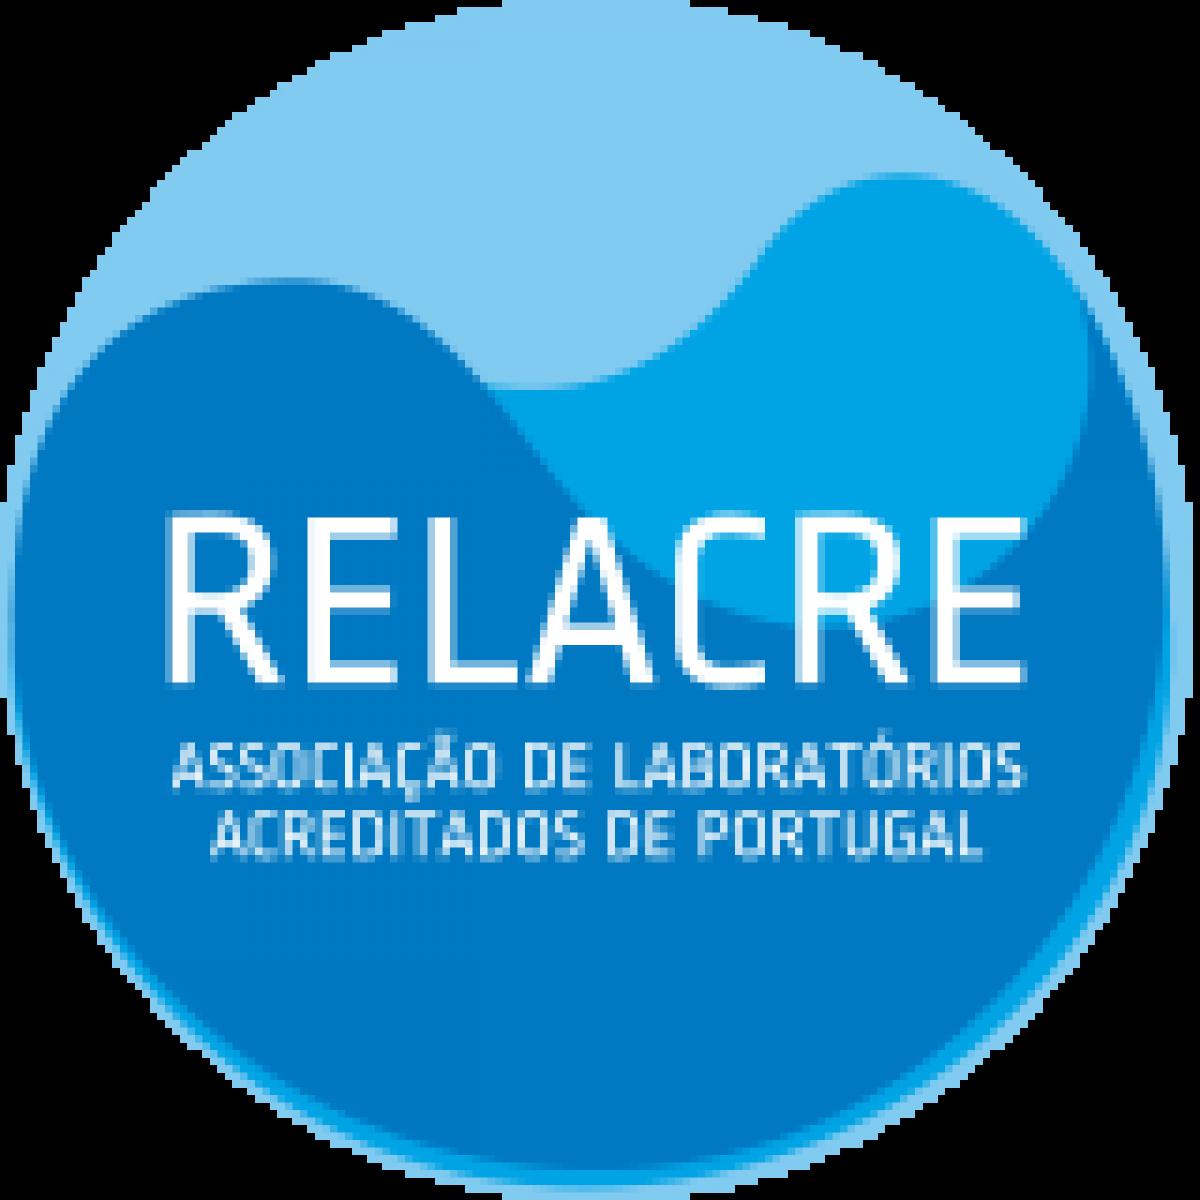 RELACRE – Webinar dia 17 de dezembro às 11:00